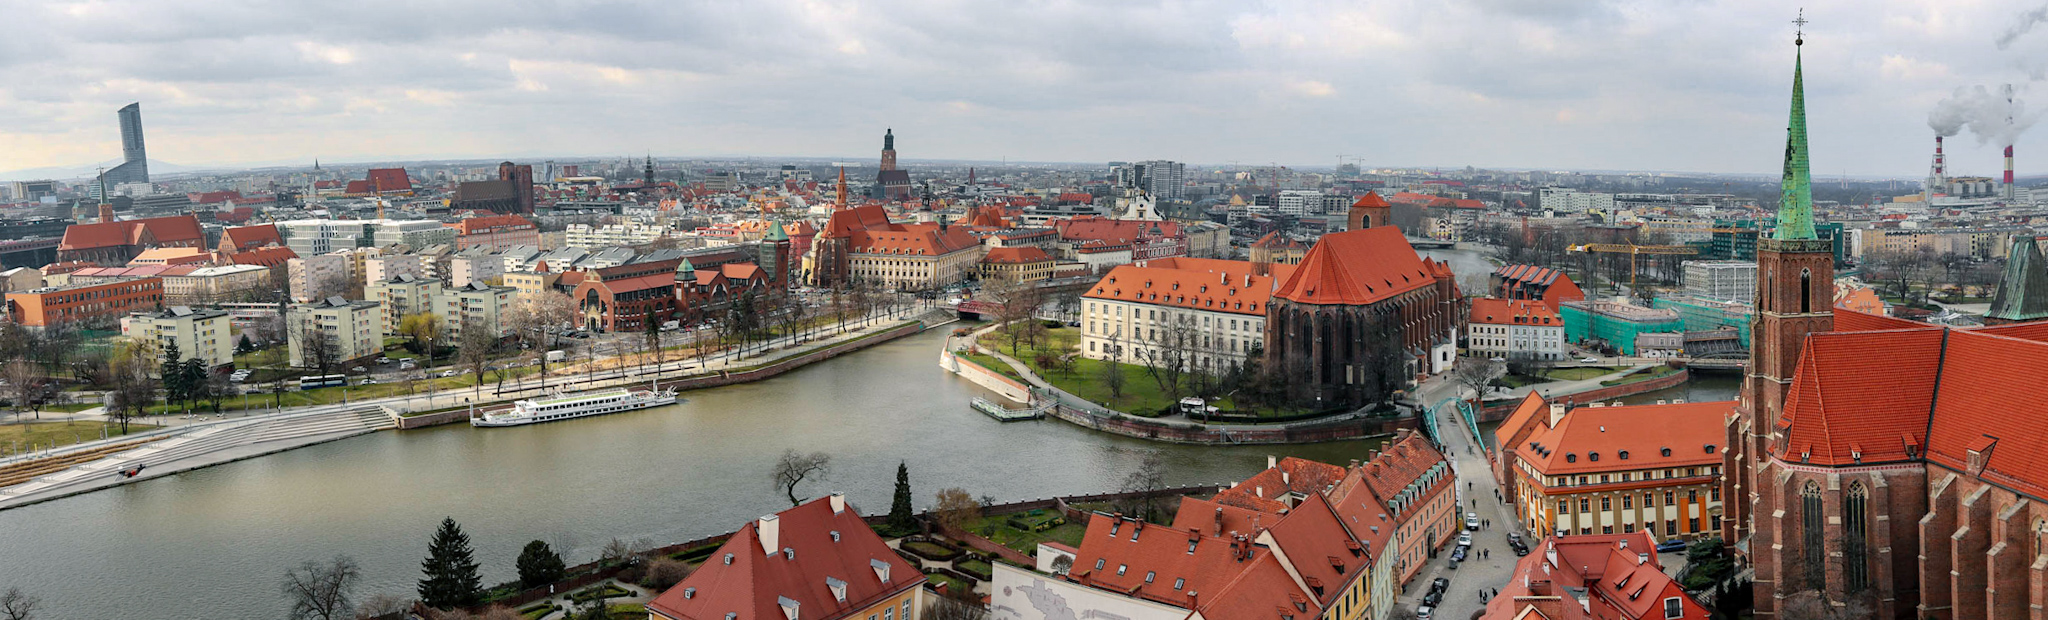 Panorama of Wrocław